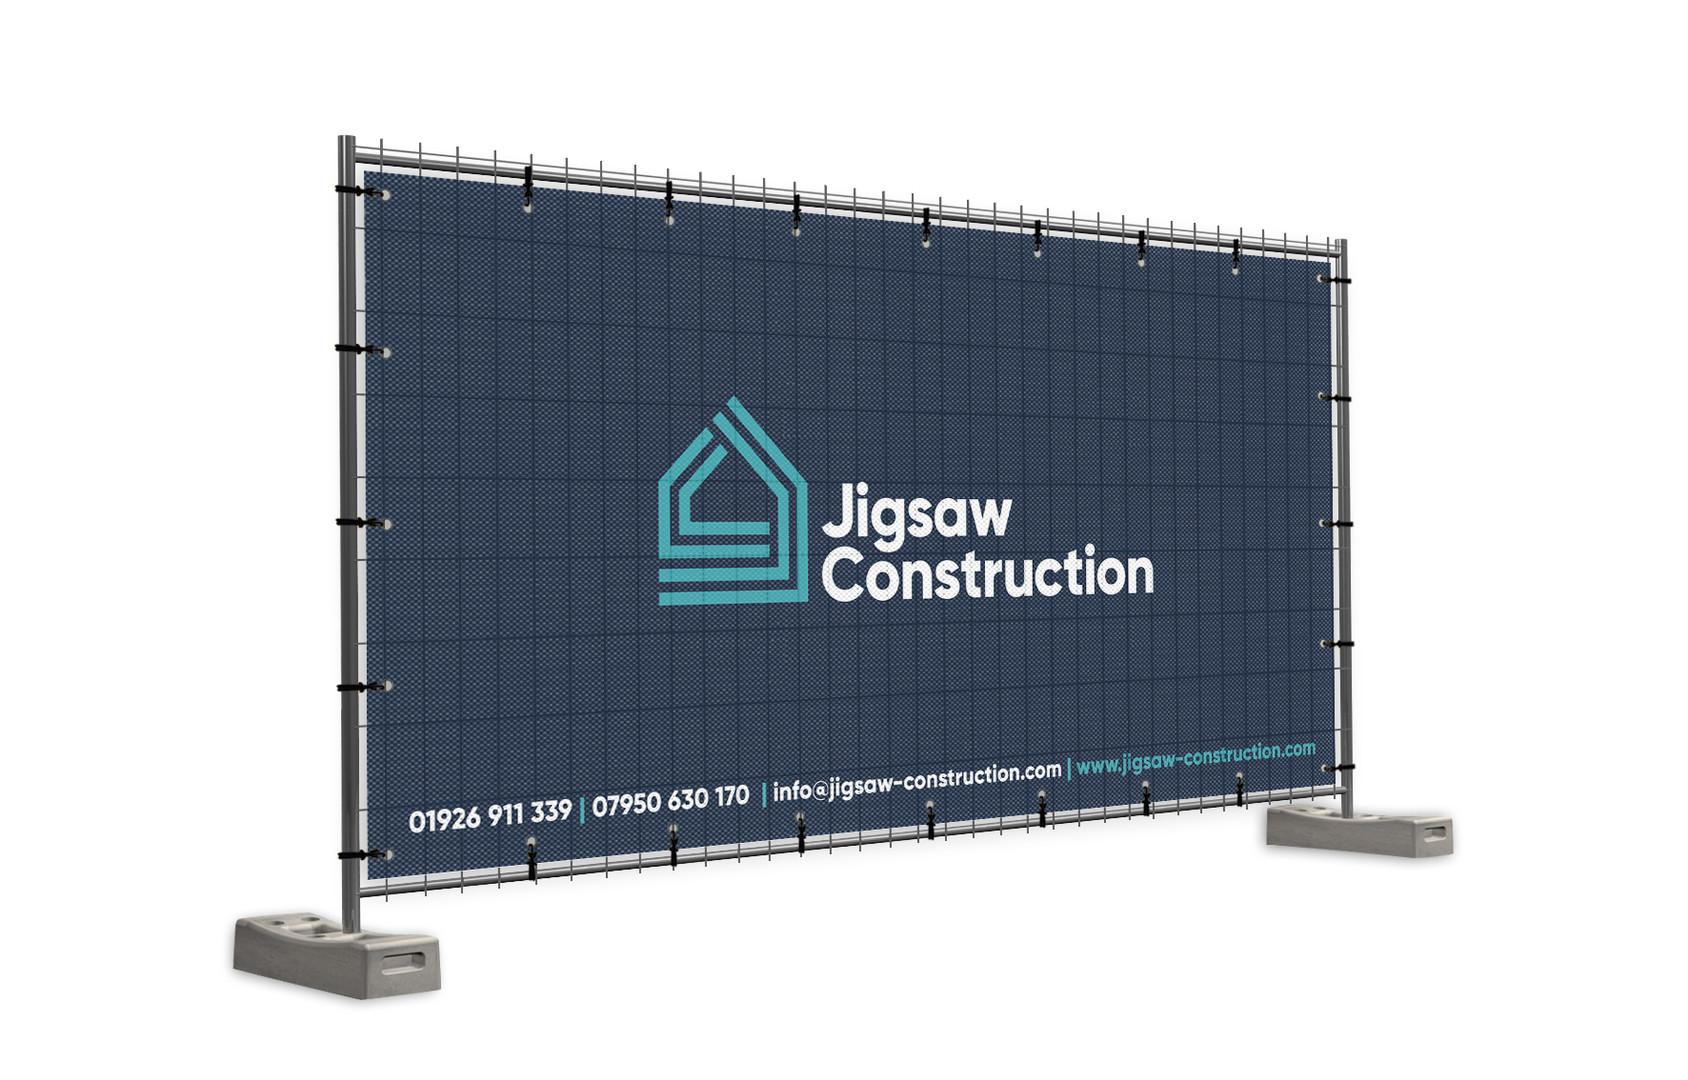 Jigsaw Construction